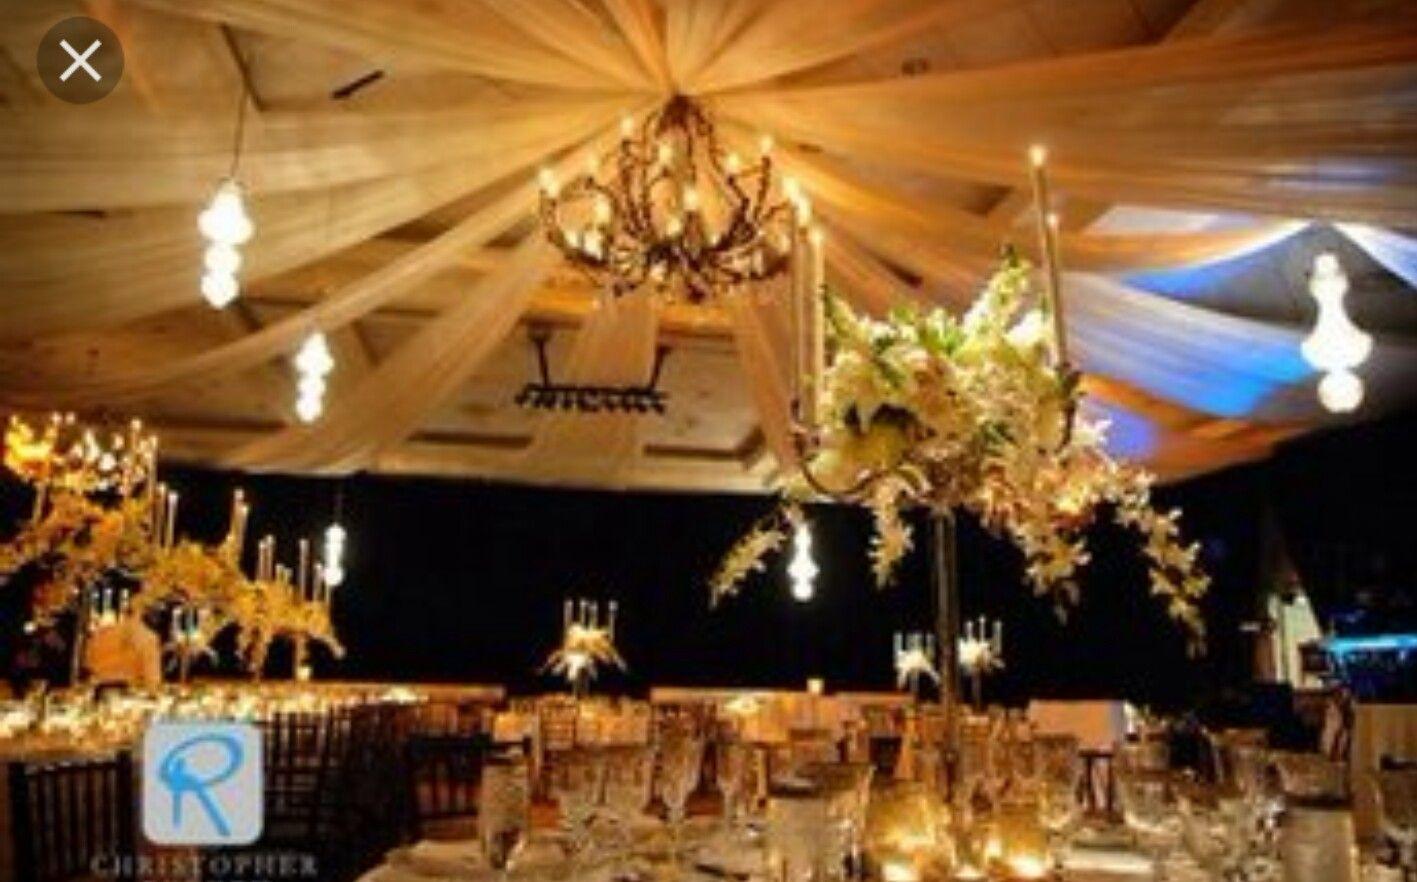 Latest wedding decor ideas  Pin by danielle breit on renewing vows ideas  Pinterest  Renewing vows